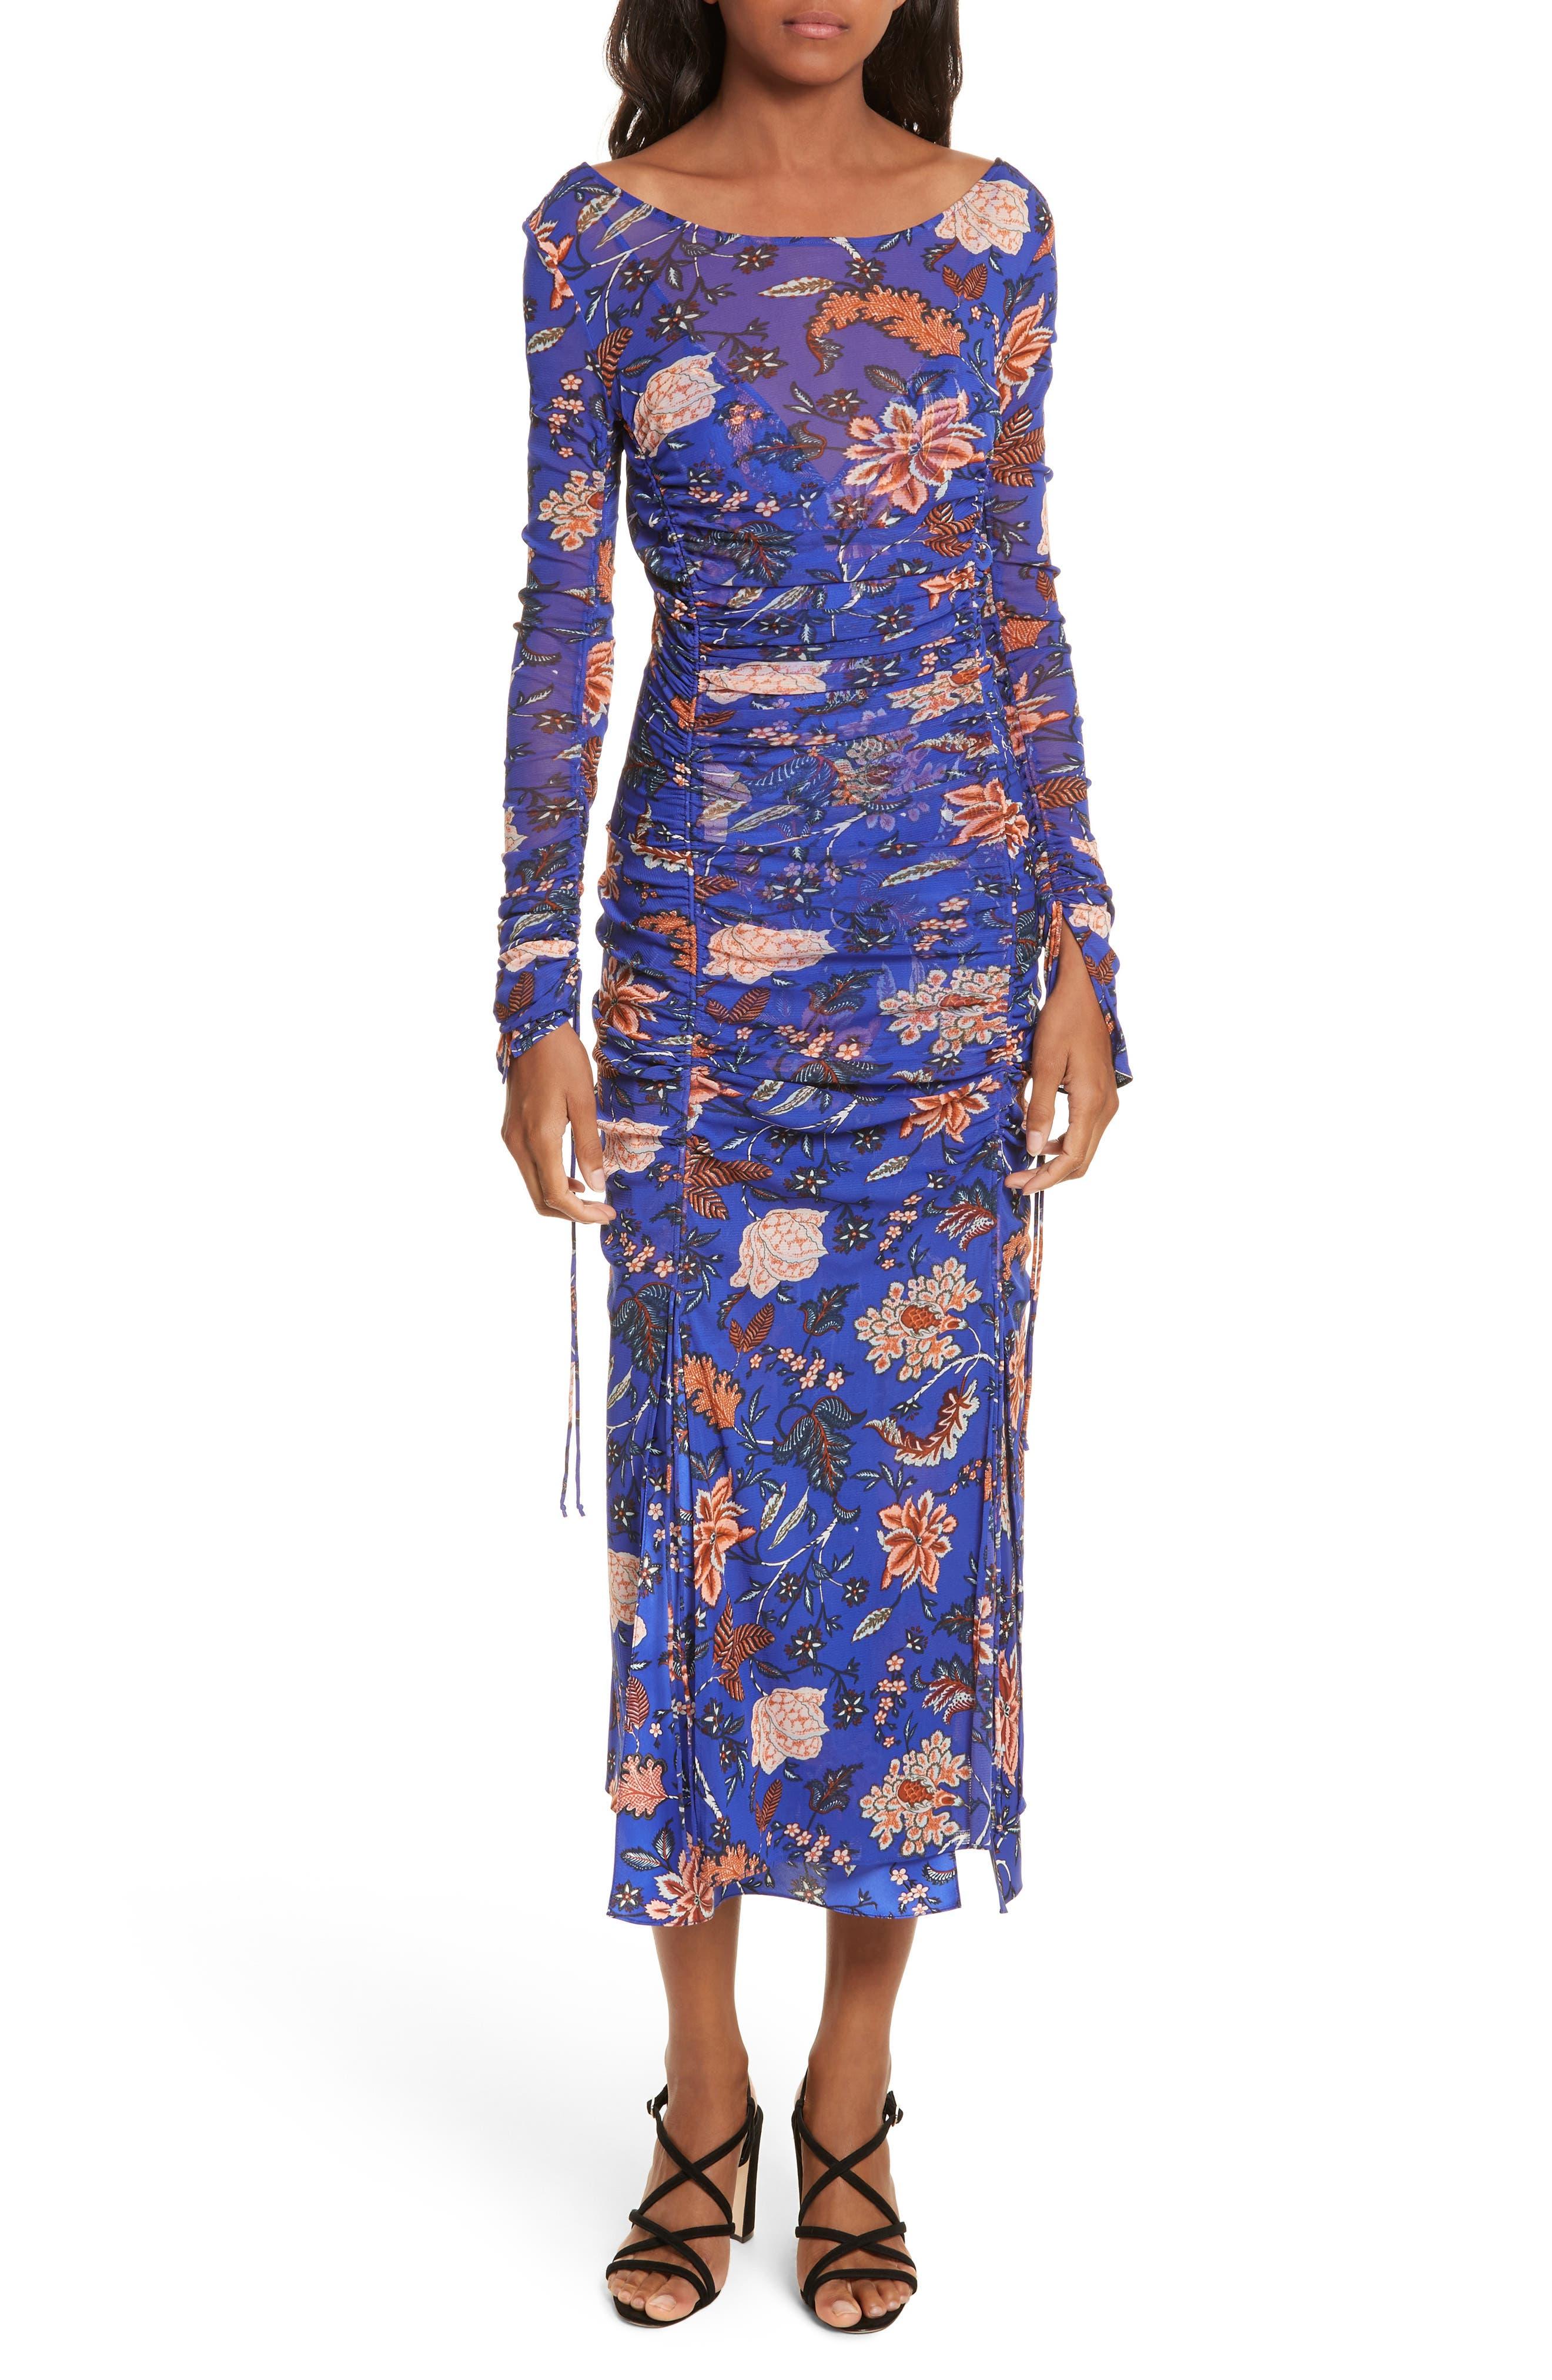 Diane von Furstenberg Mesh Overlay Floral Midi Dress,                             Main thumbnail 1, color,                             Canton Electric Blue